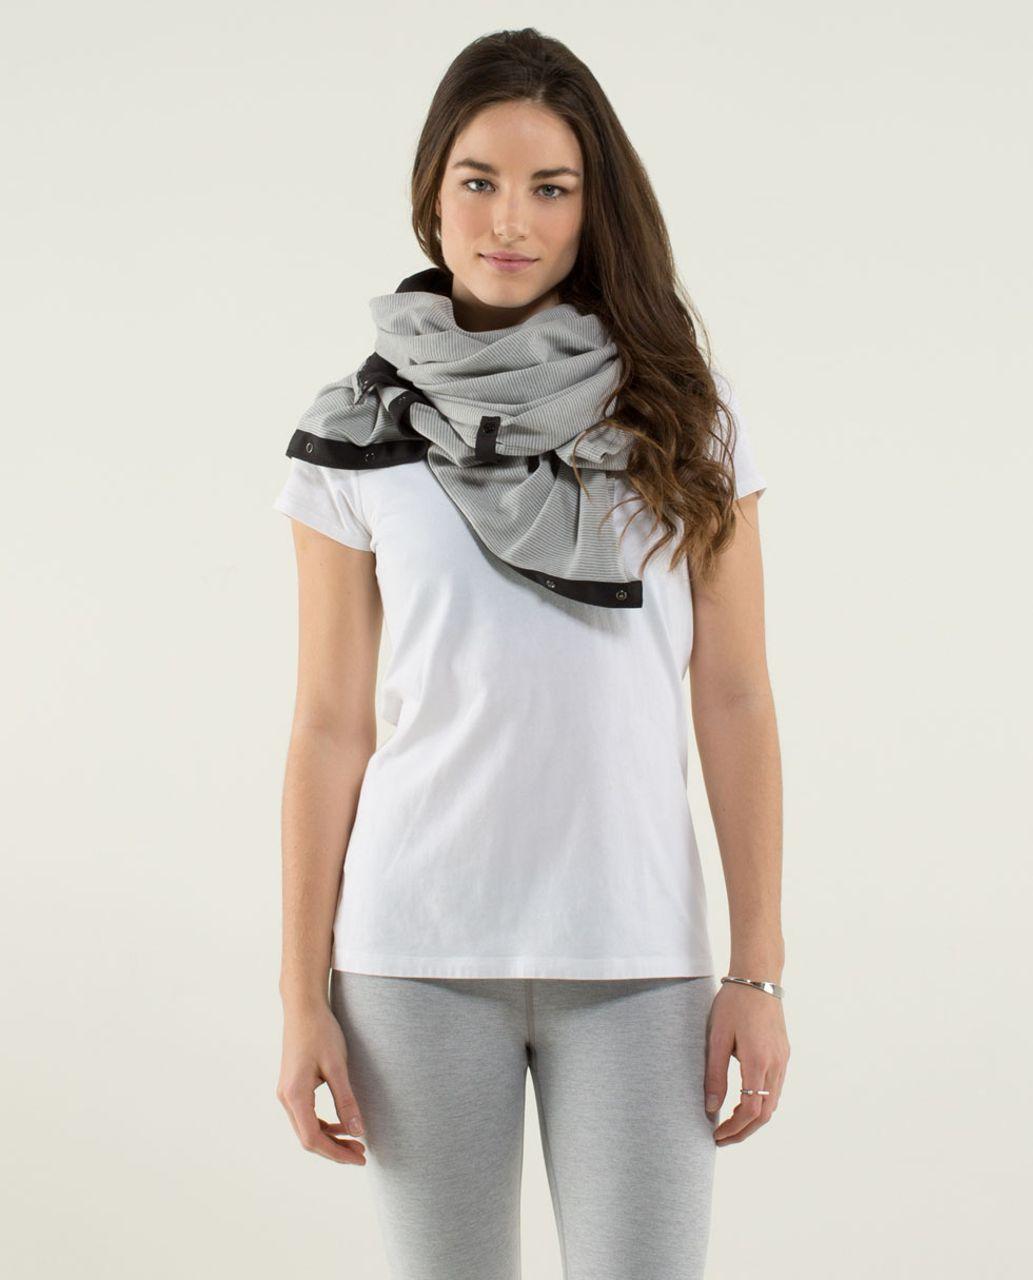 Lululemon Vinyasa Scarf *Rulu - Black / Tonka Stripe Heathered Light Grey Heathered Medium Grey